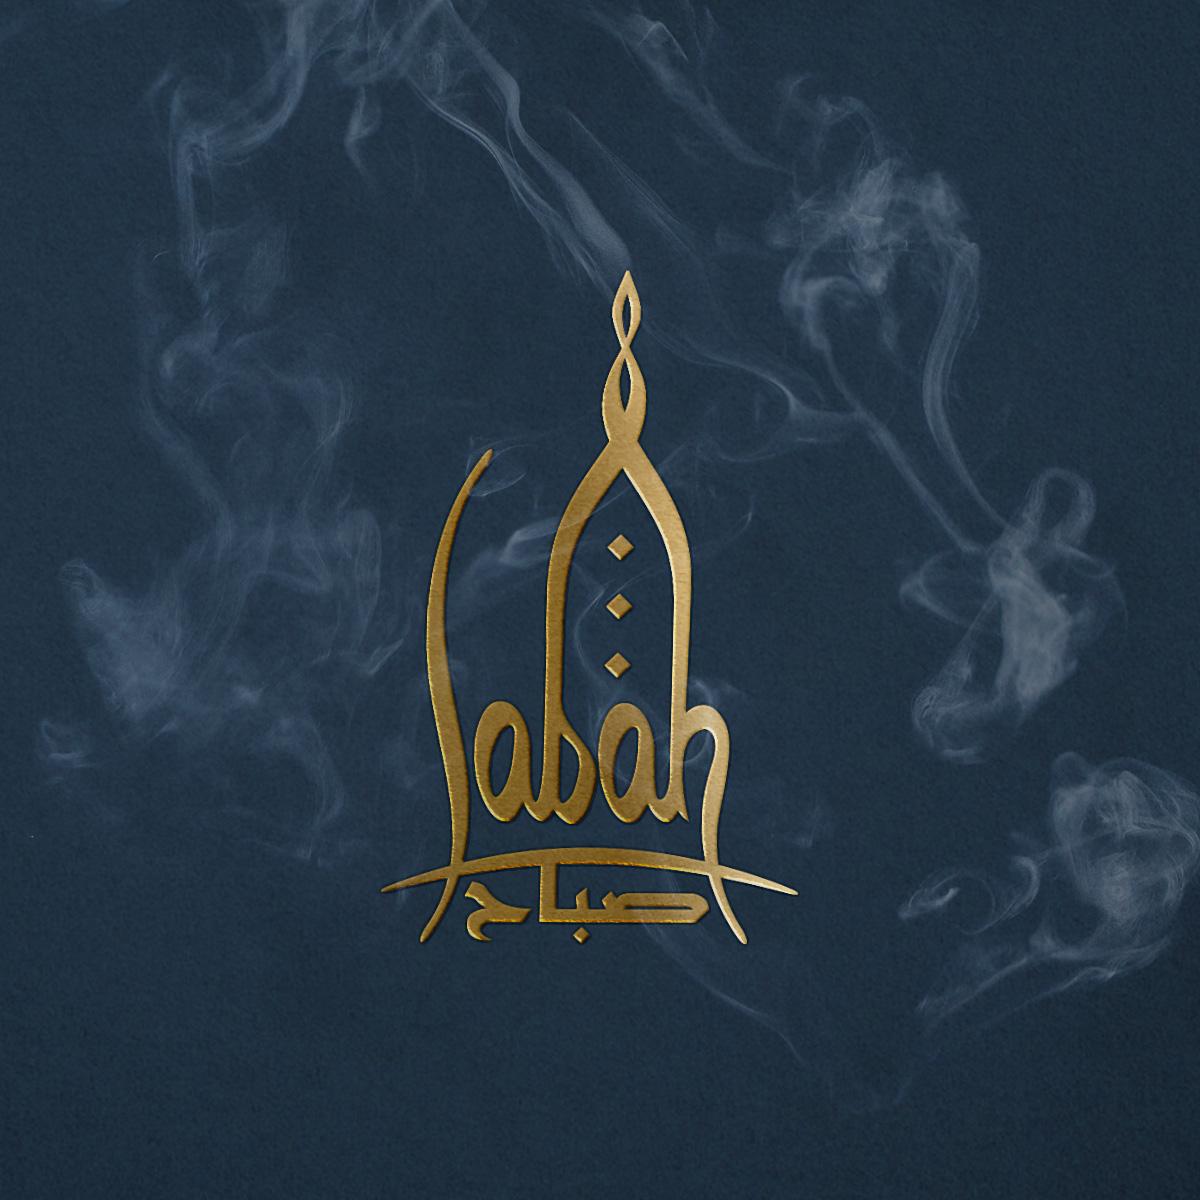 Sabah. Brand identity for a Dubai based company